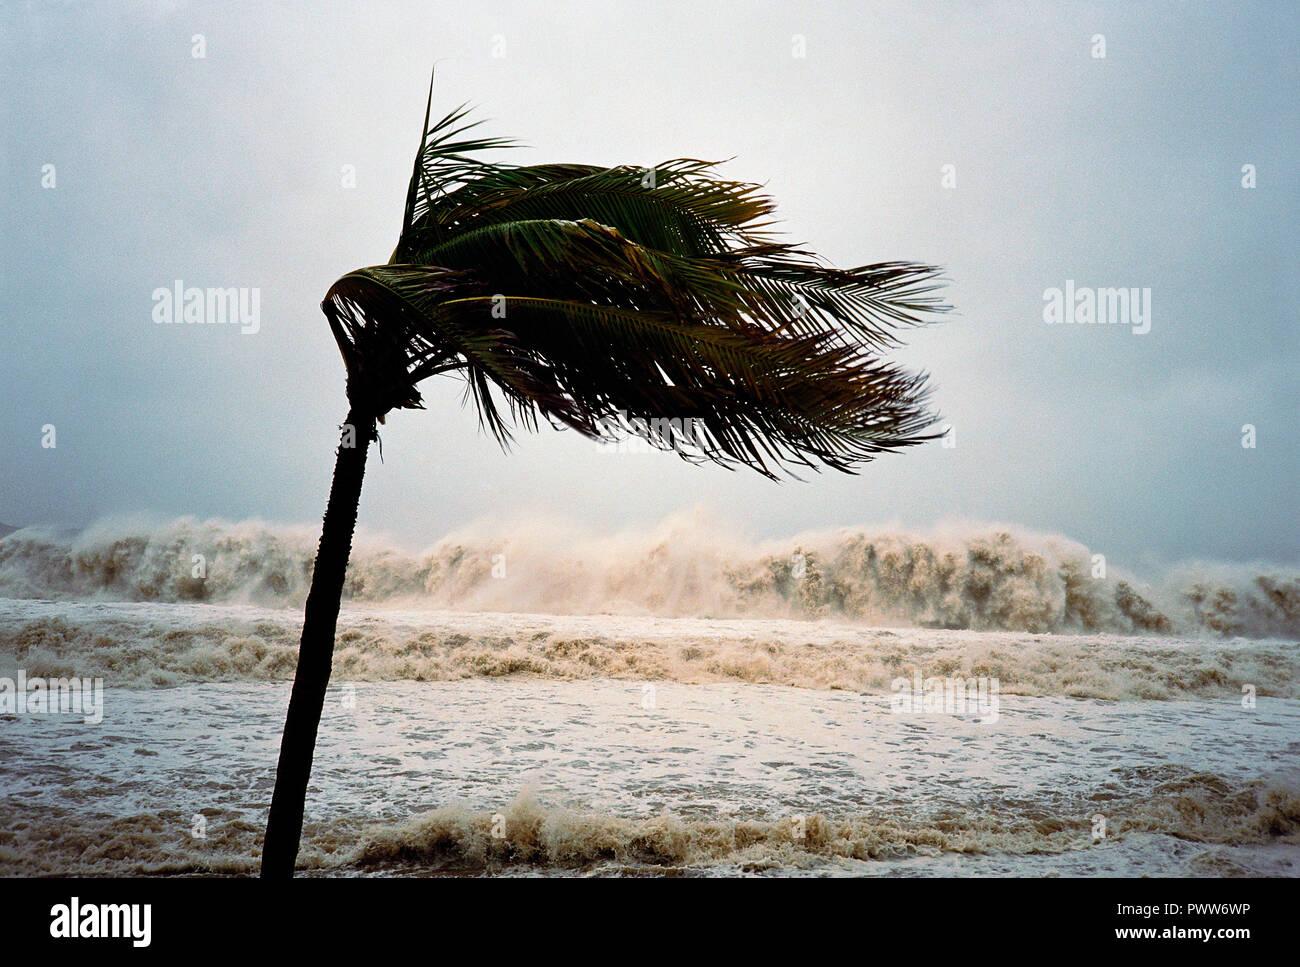 Hurricane Ignacio making landfall in Baja,  Mexico. Stock Photo